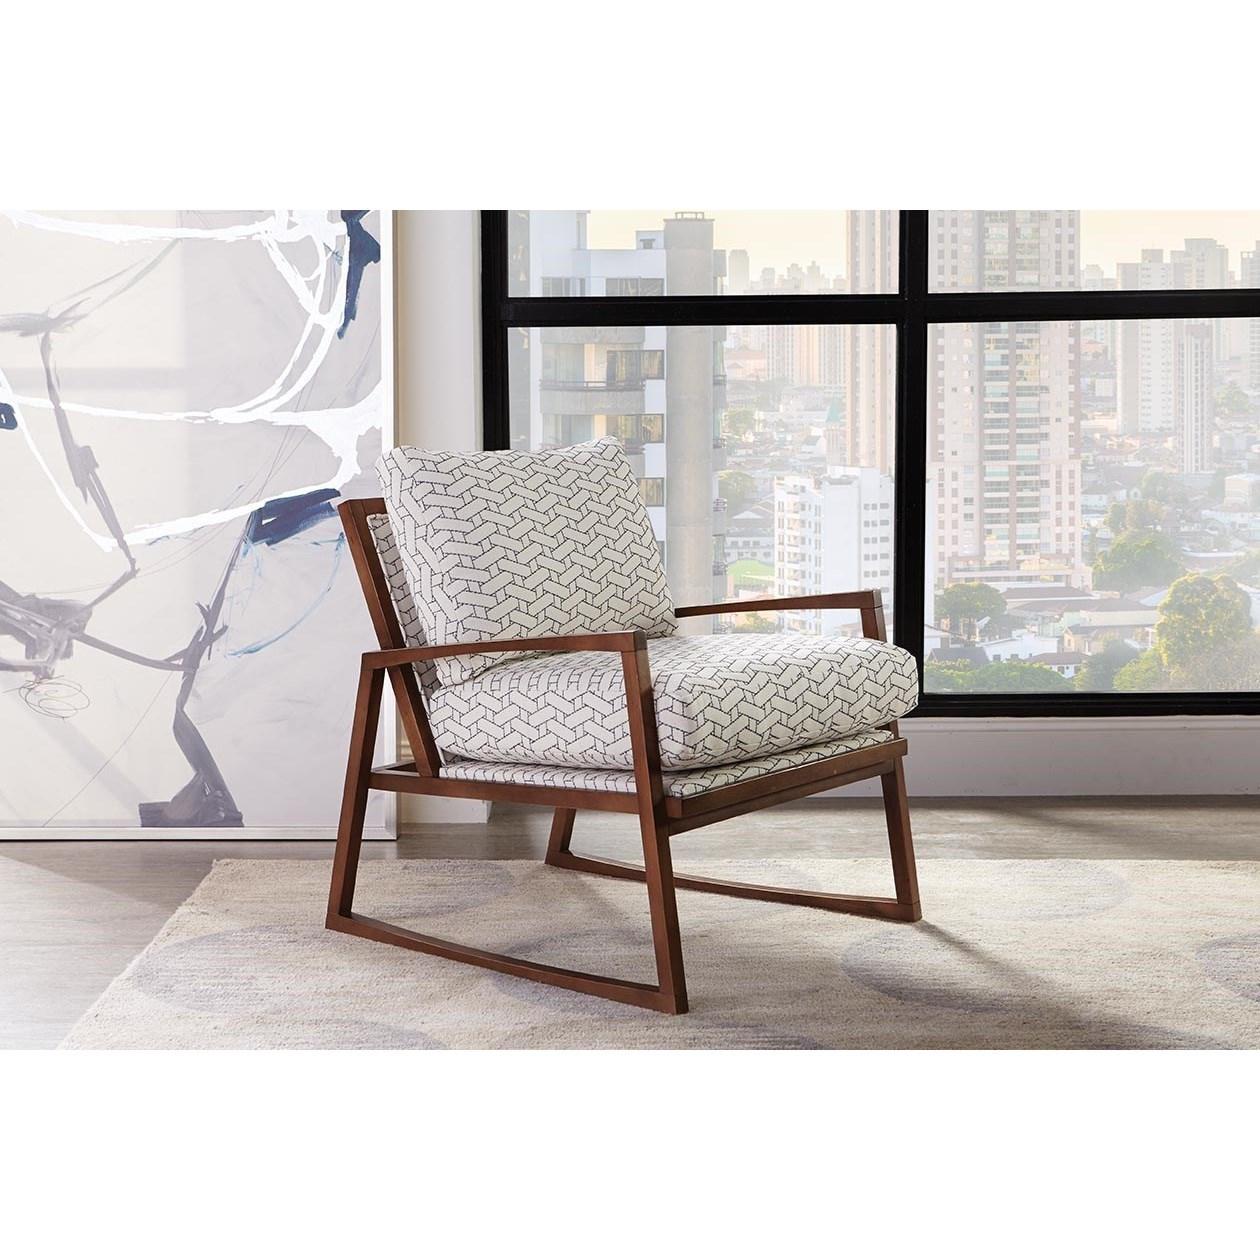 Beckett Modern Chair by Rowe at Baer's Furniture